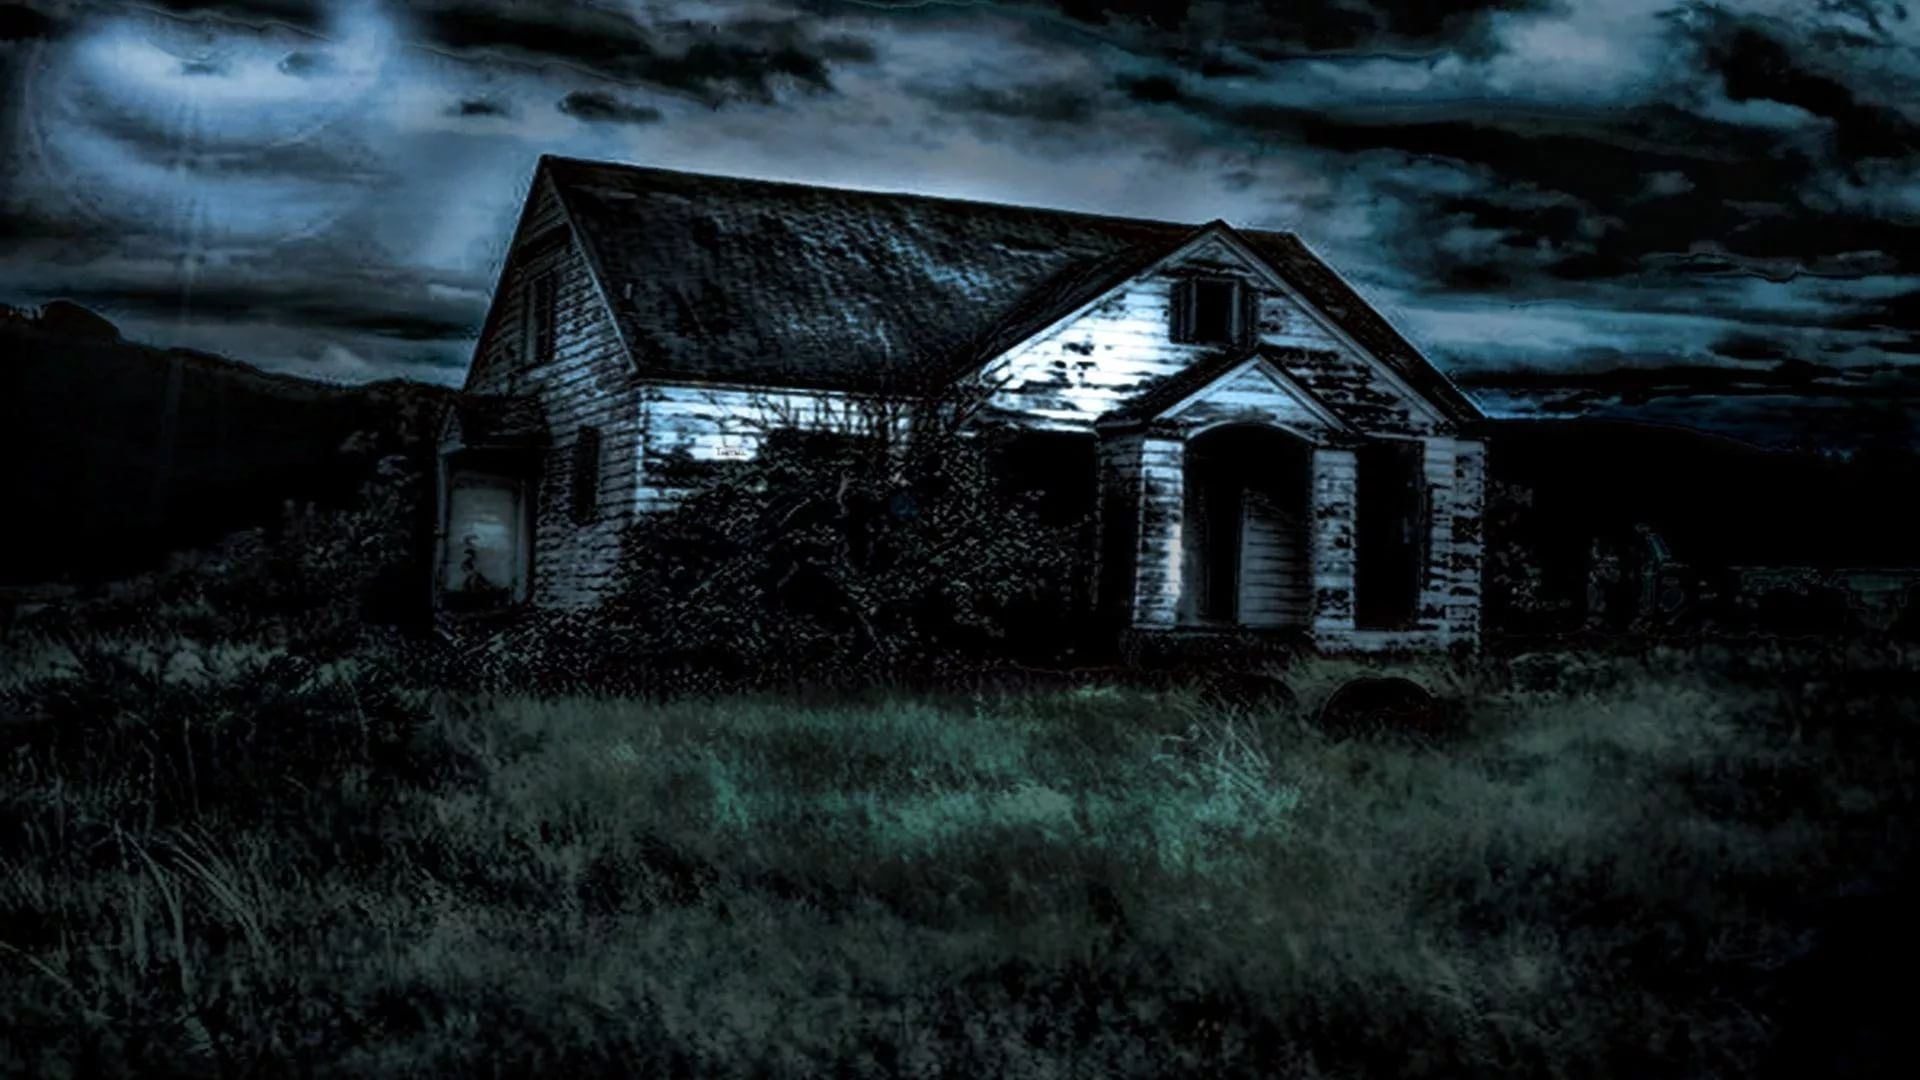 Horror wallpaper download